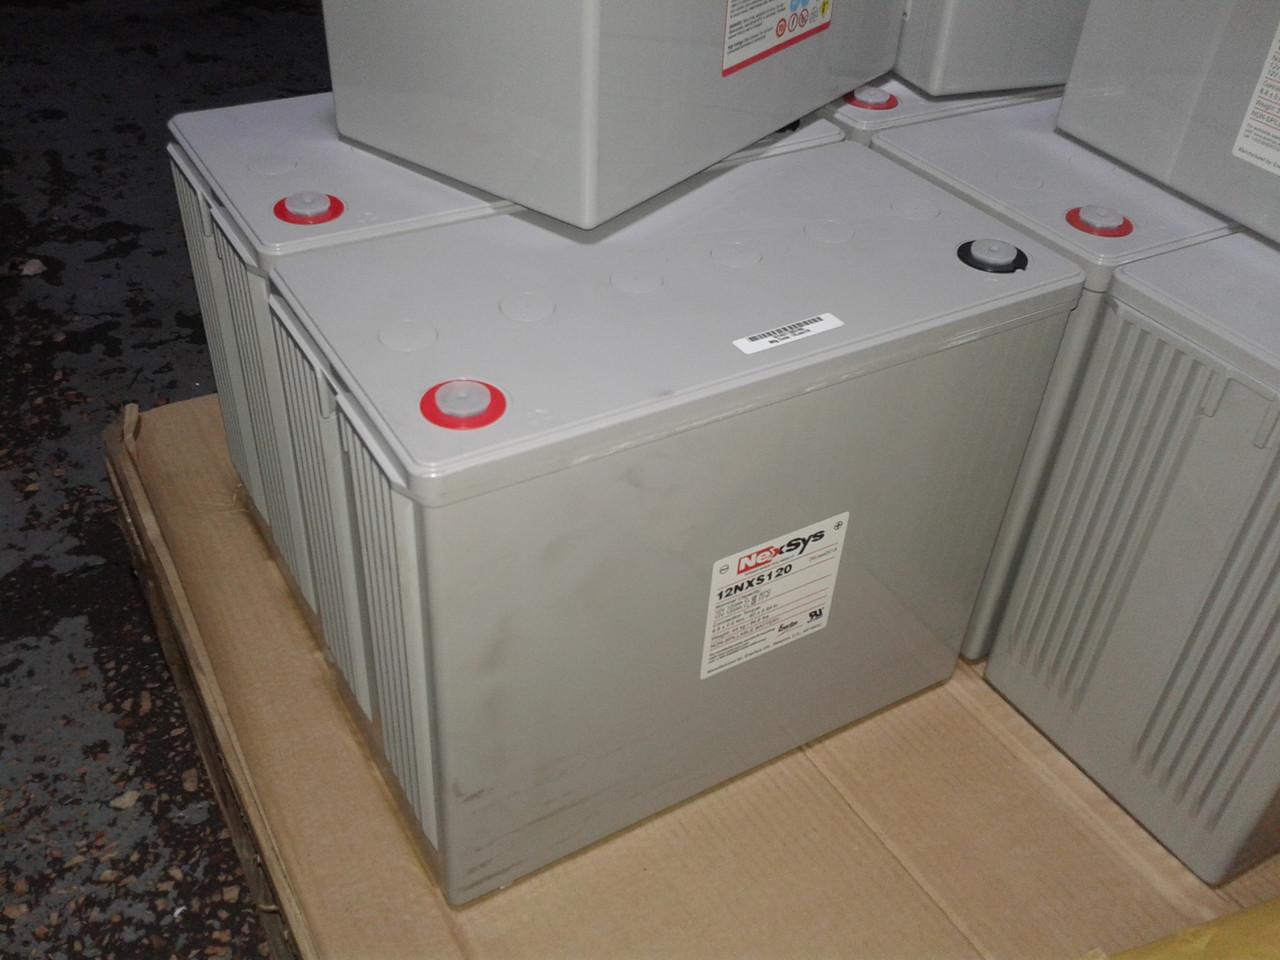 Быстро заряжаемый аккумулятор NexSys 12NXS120 (Hawker XFC115) 12В, 120Ач